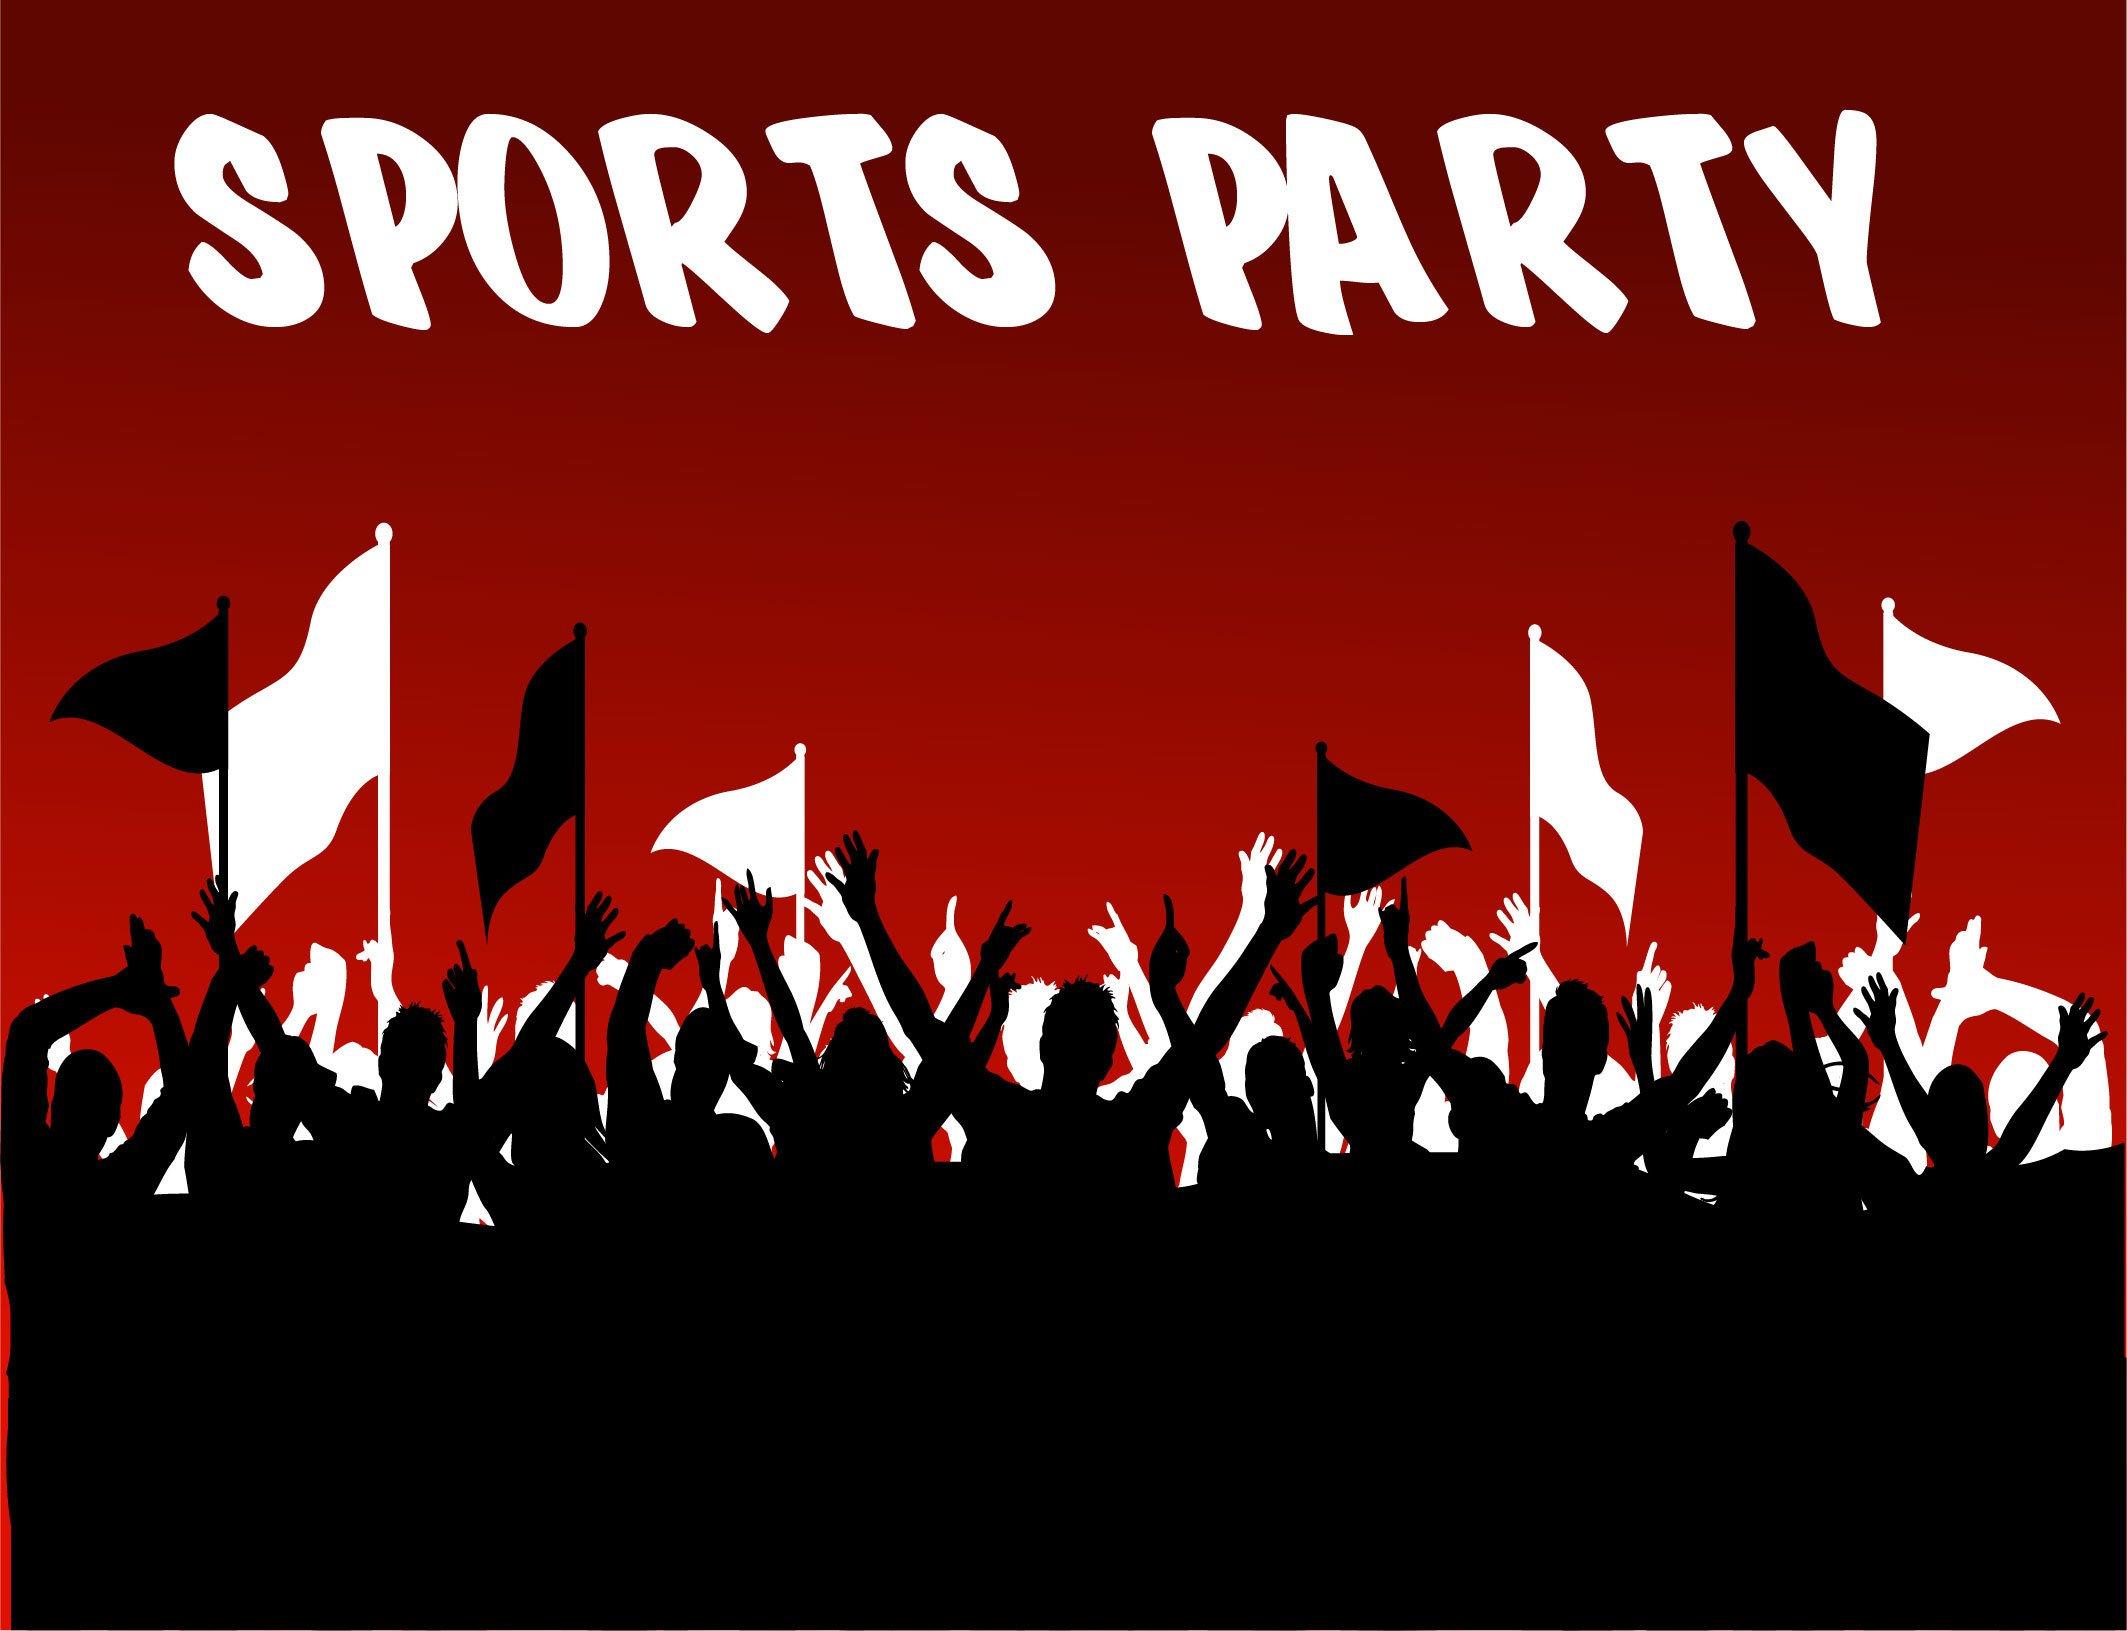 Backdrop Sports Party 3m x 2.4m $60 incl gst